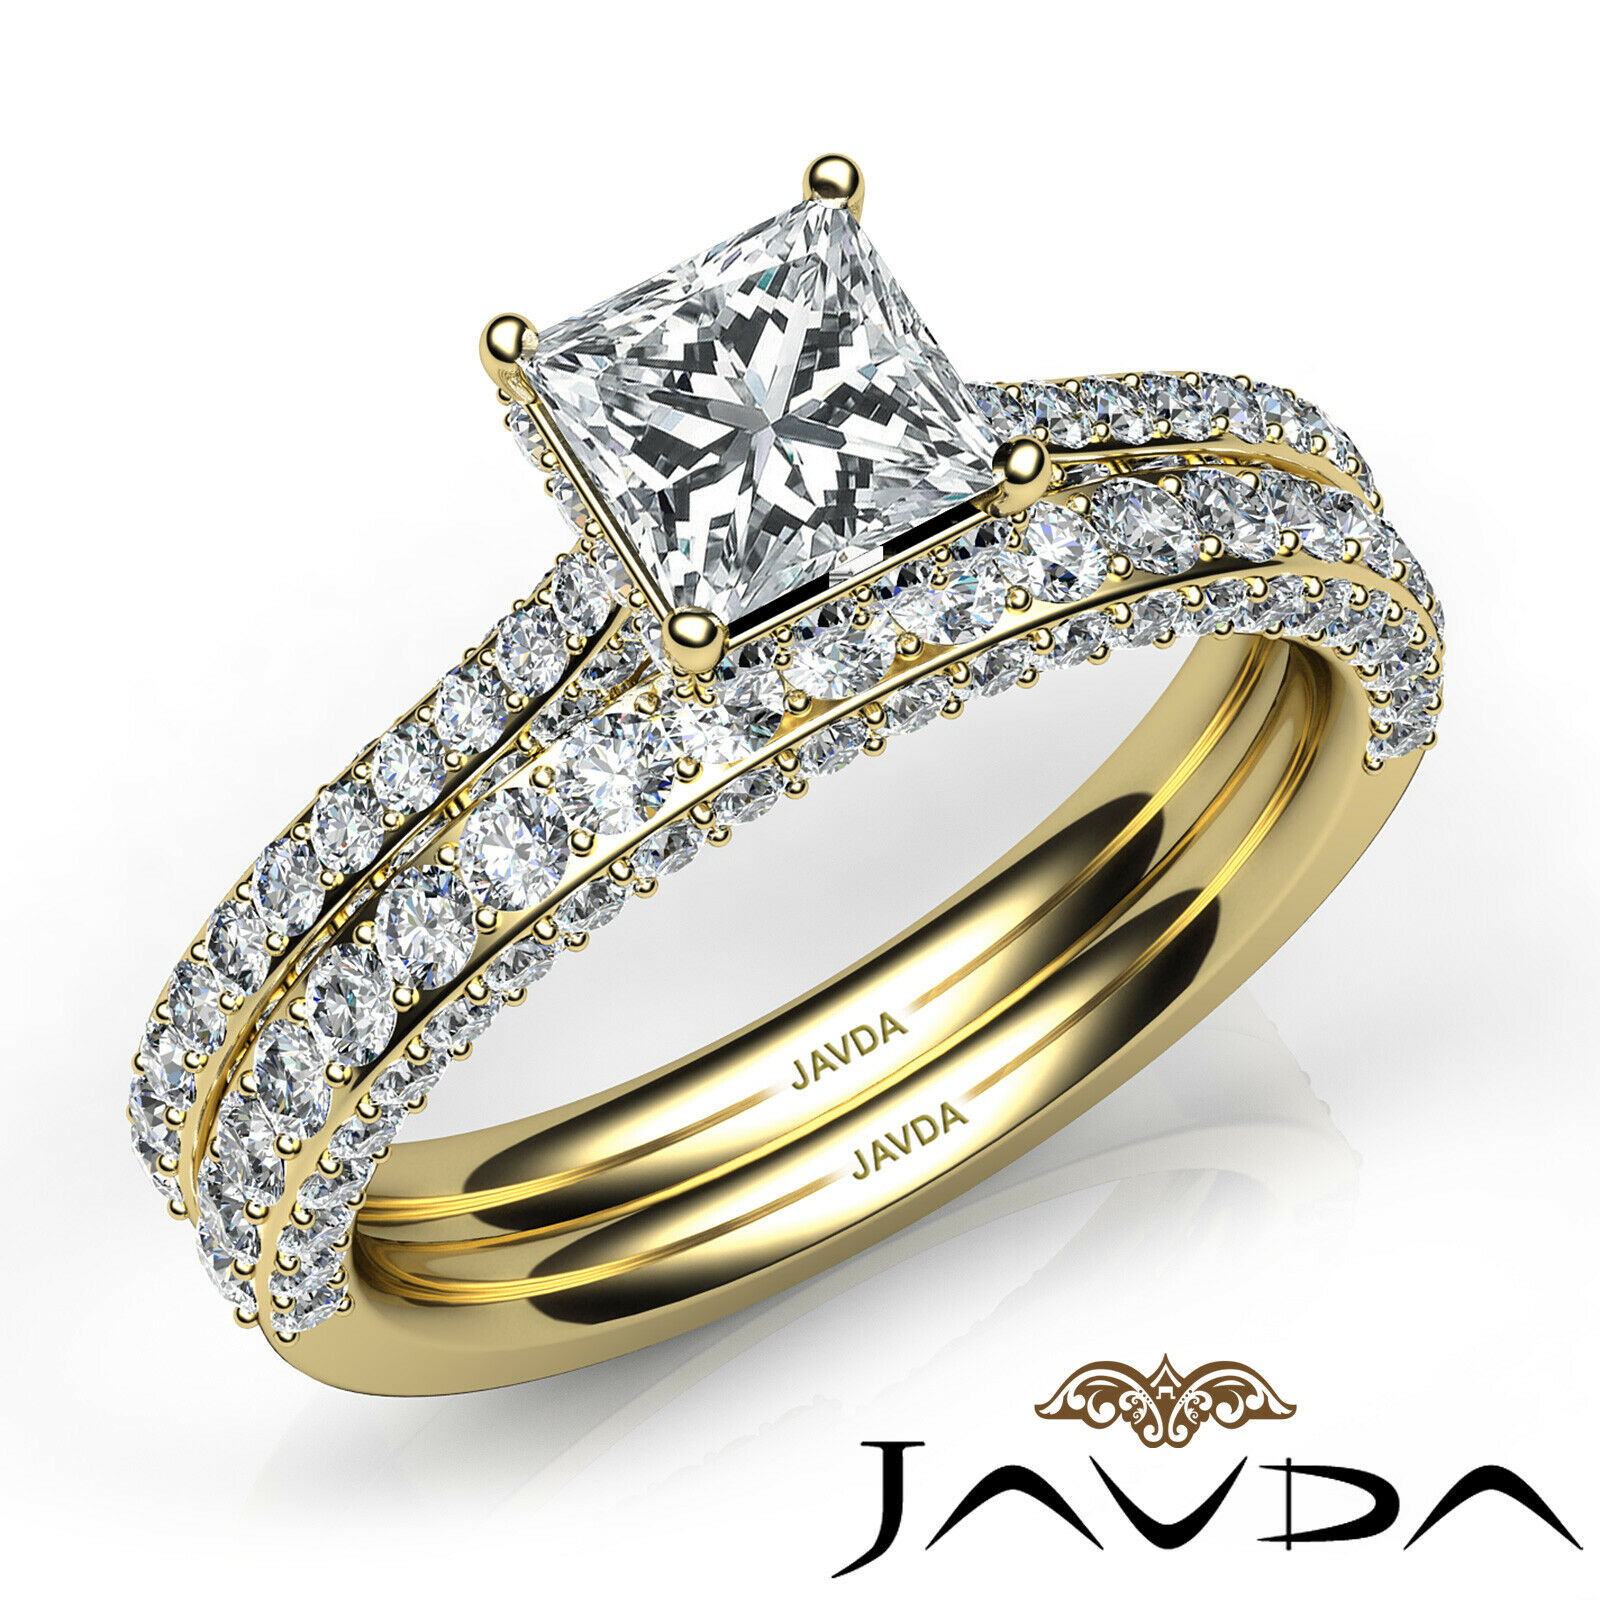 2.35ctw Circa Halo Pave Wedding Set Princess Diamond Engagement Ring GIA G-VVS1 9